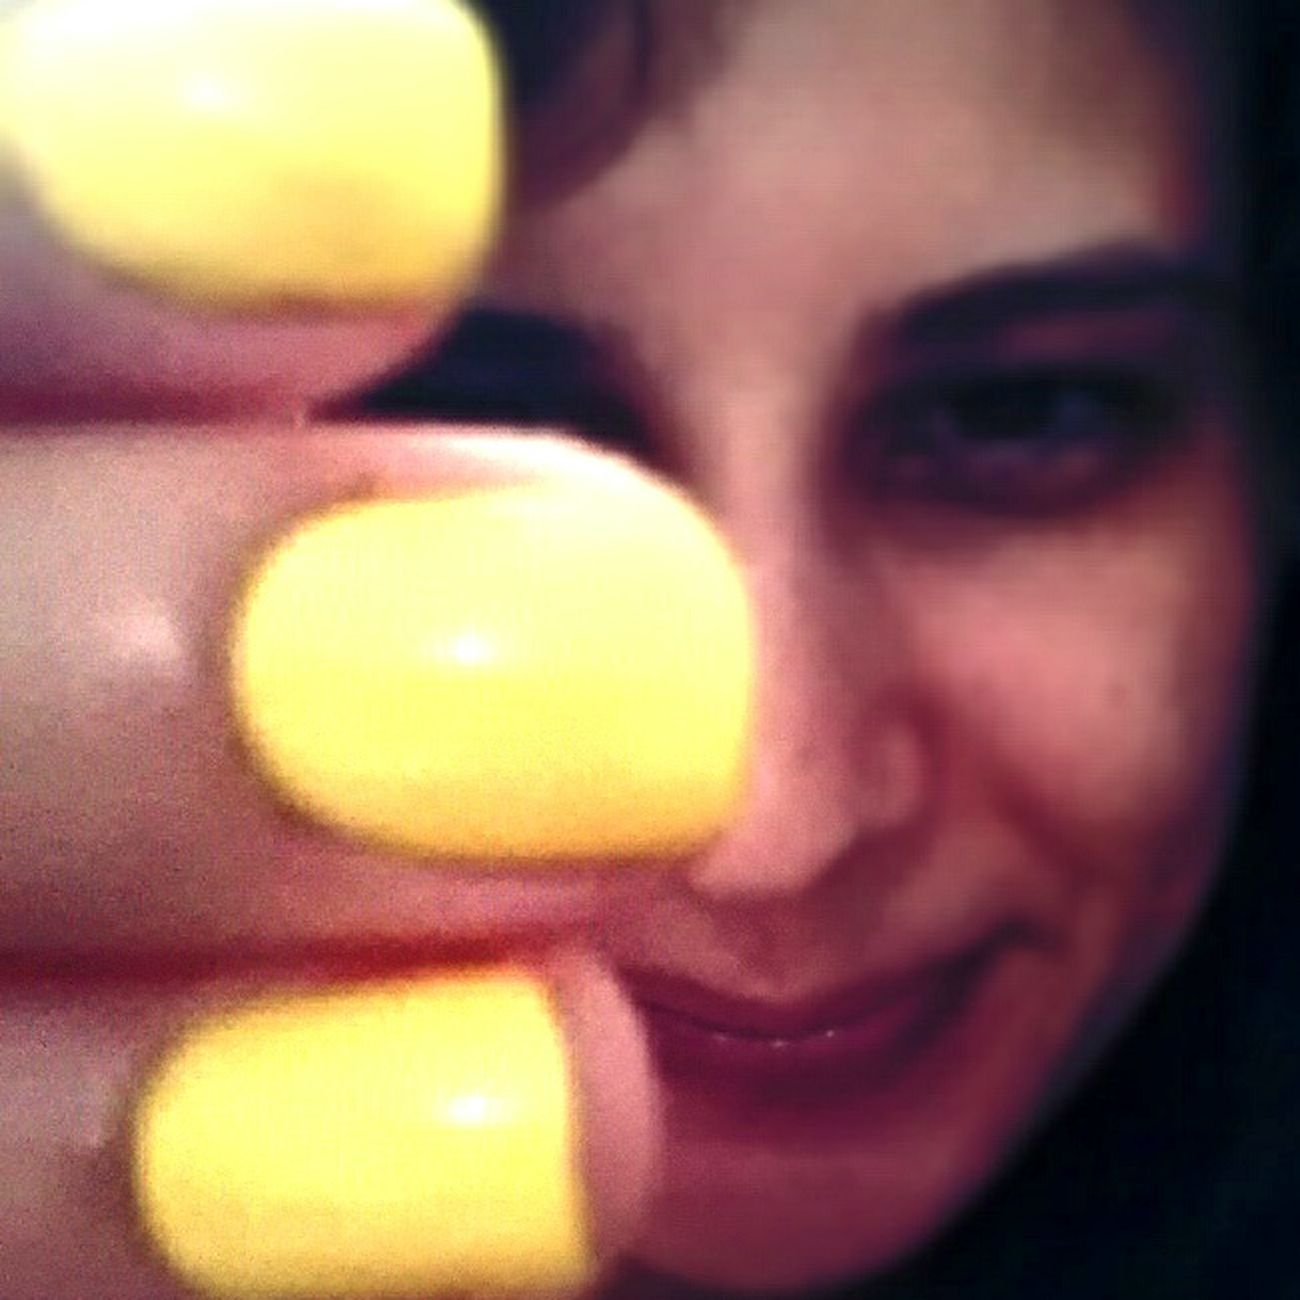 Relaxing Taking Photos Women Woman Portrait Woman Urban Woman Urban Style Urban Hand Nails Nail Nails <3 Self Portrait Selfie ✌ Selfie Myself Yellow